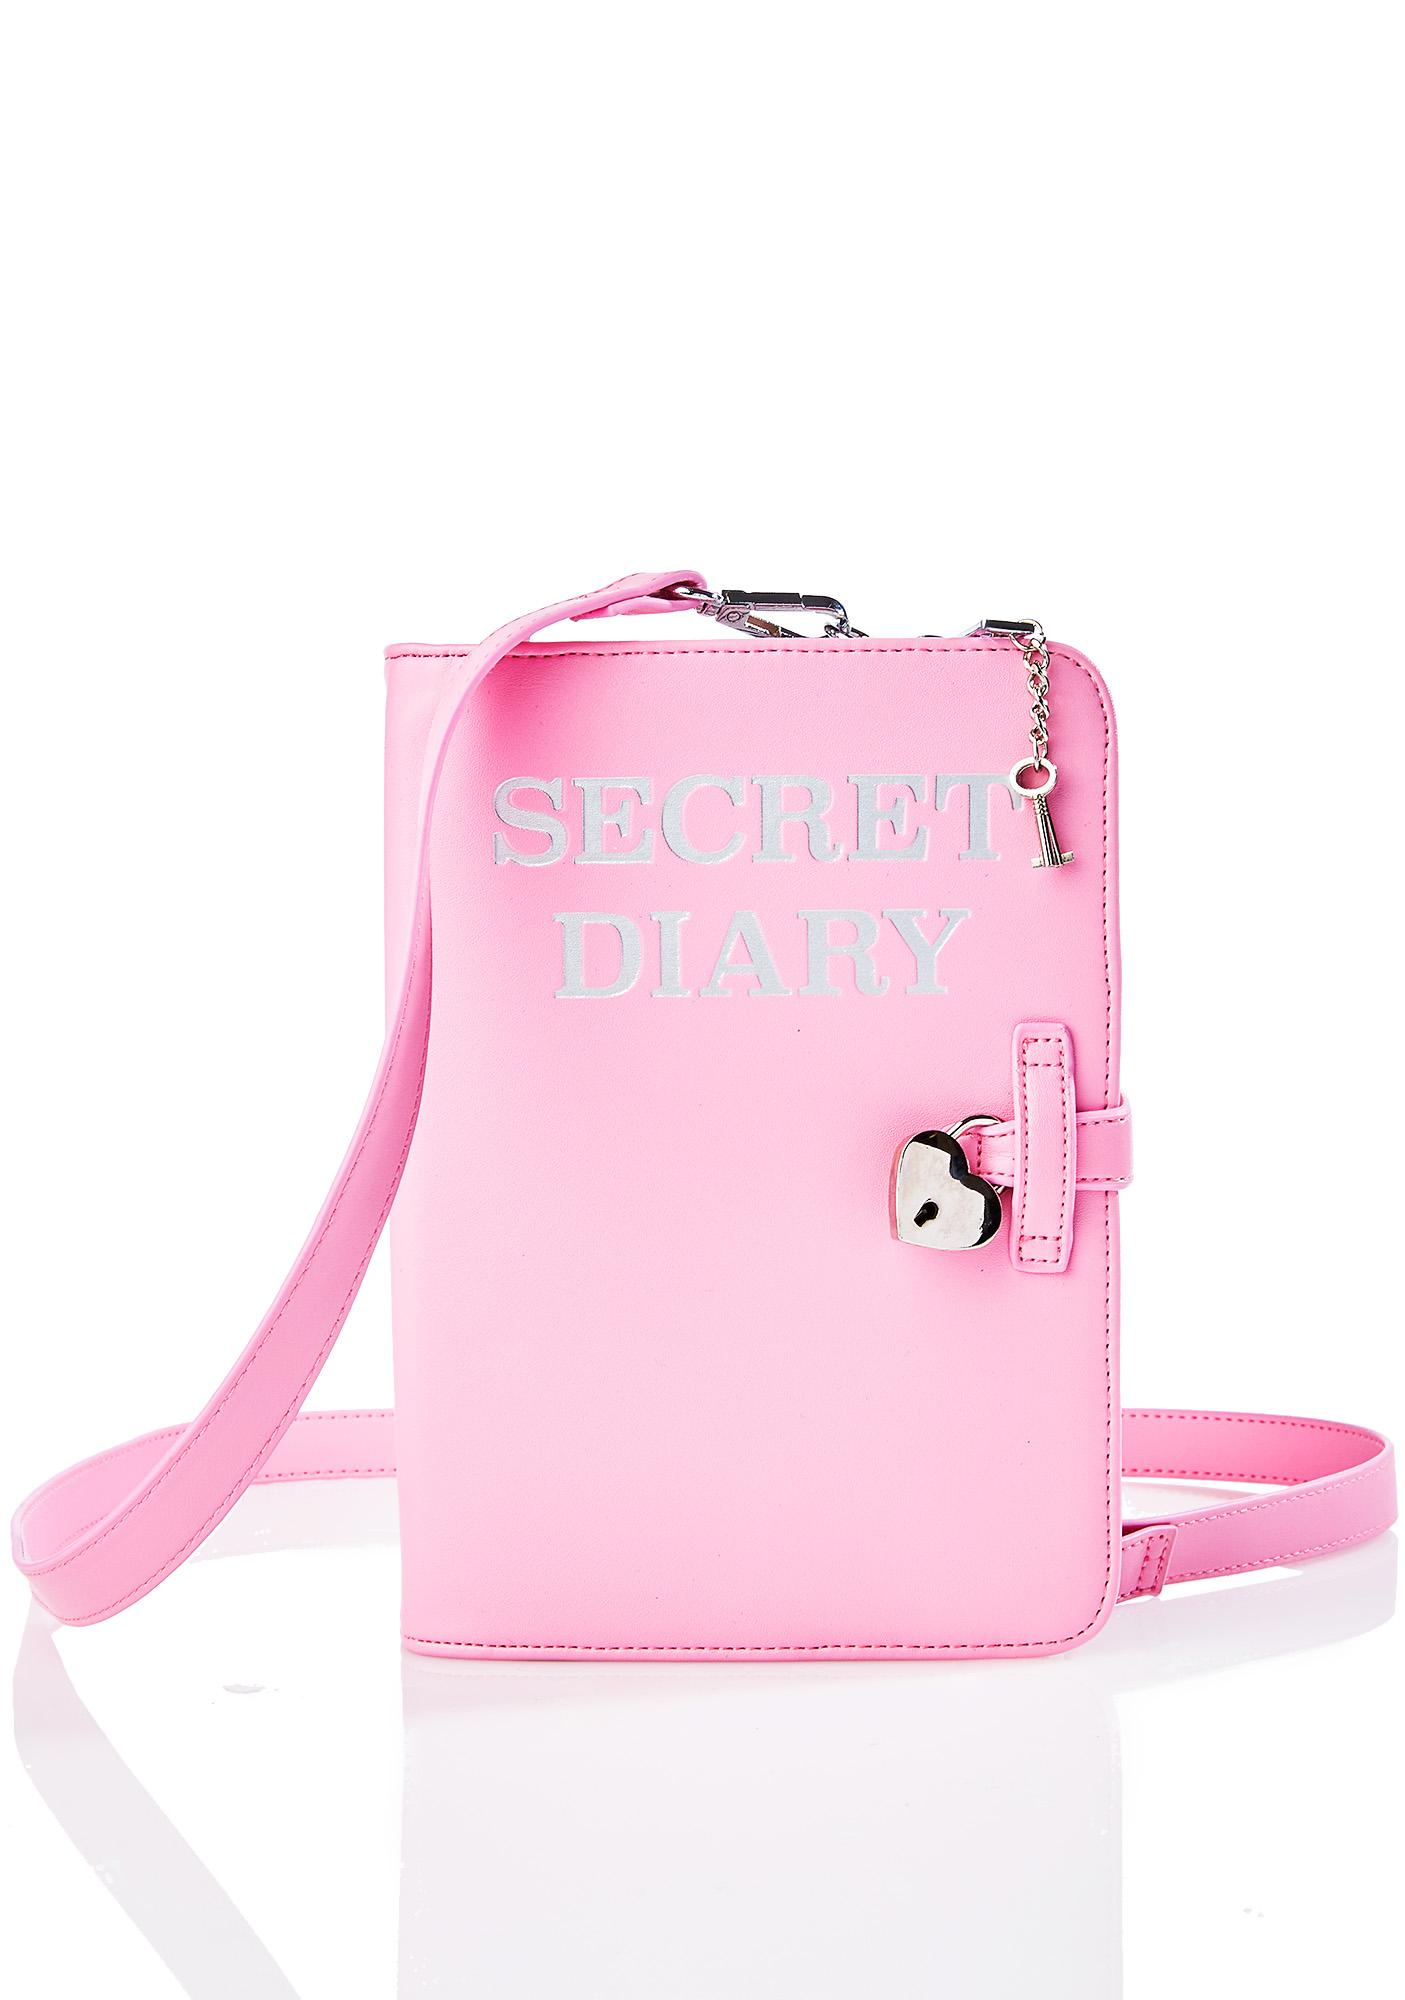 Sugar Thrillz Secret Diary Purse